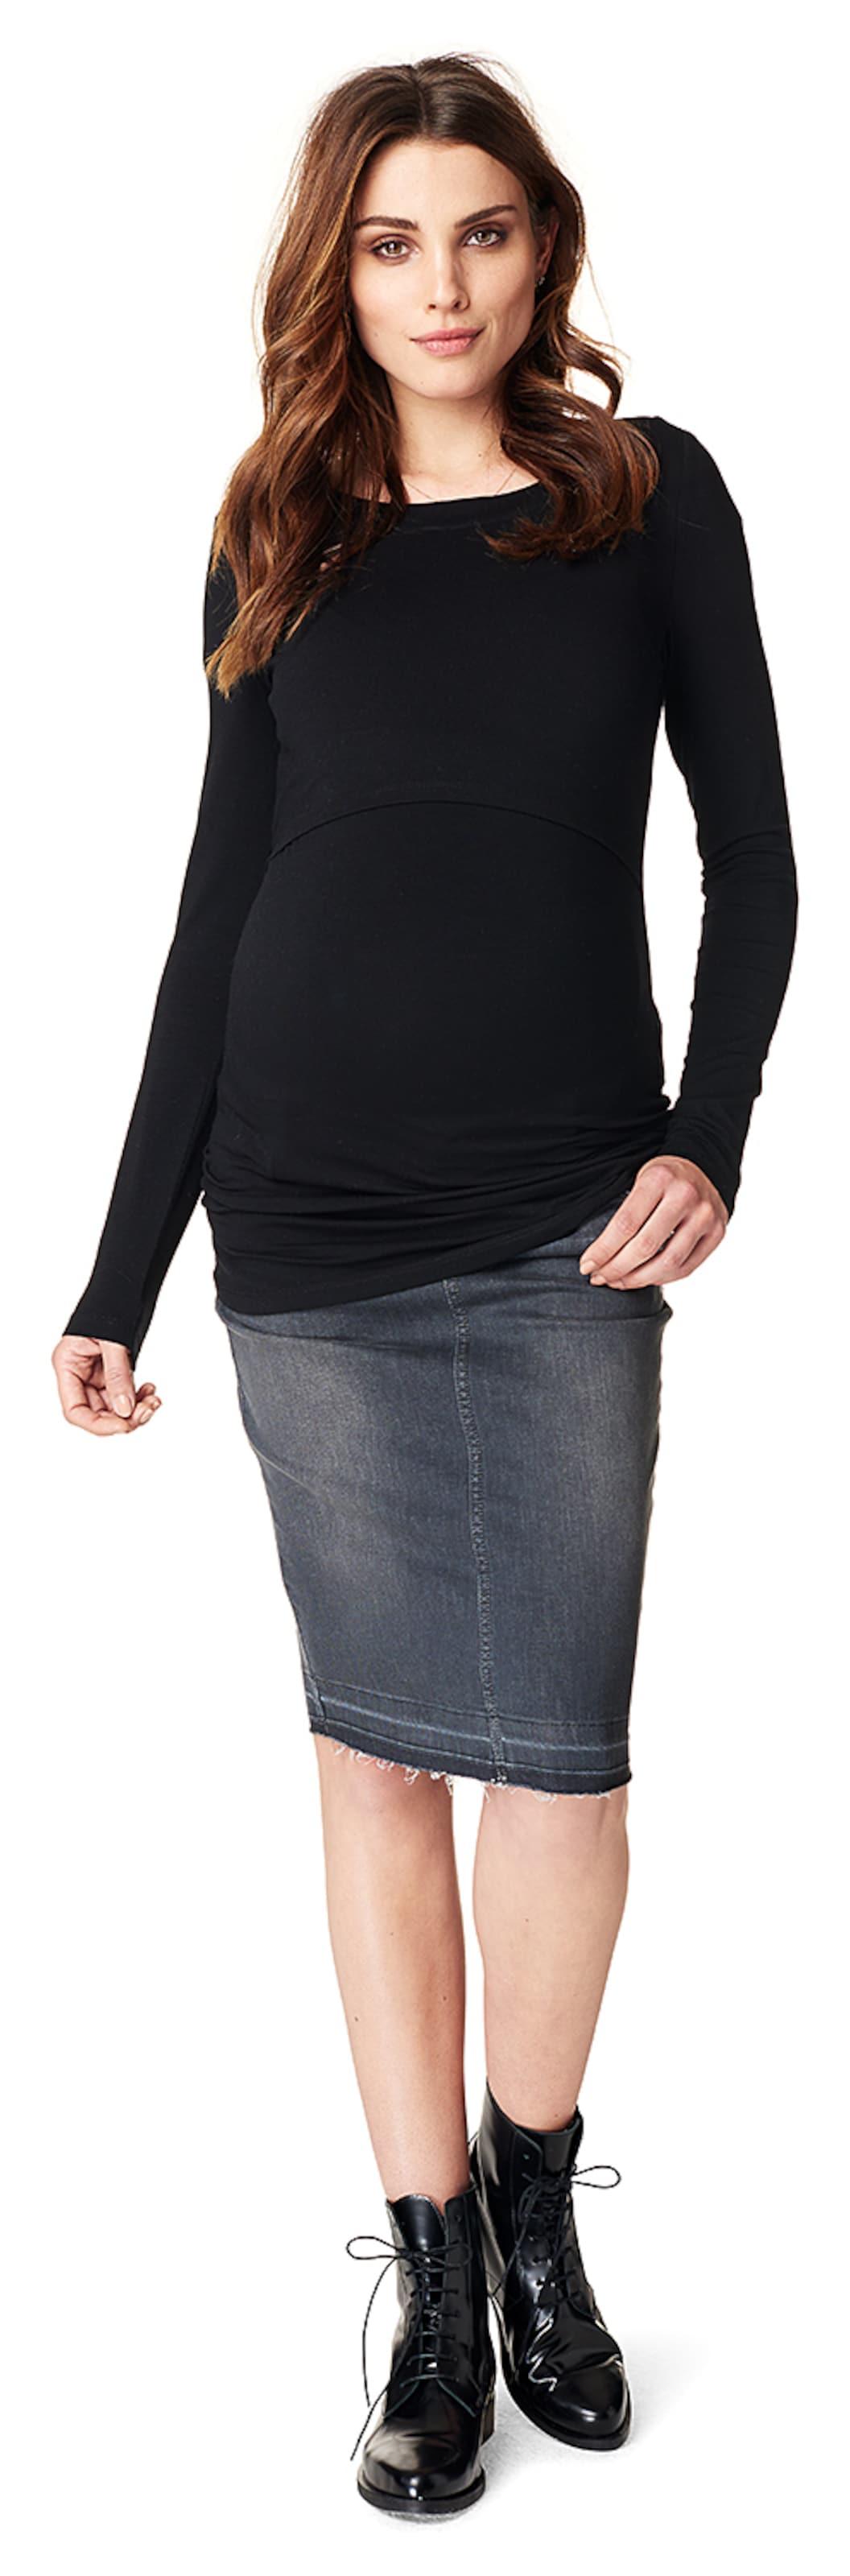 Umstandsrock In Grau Joy Noppies Jeans JclF1K